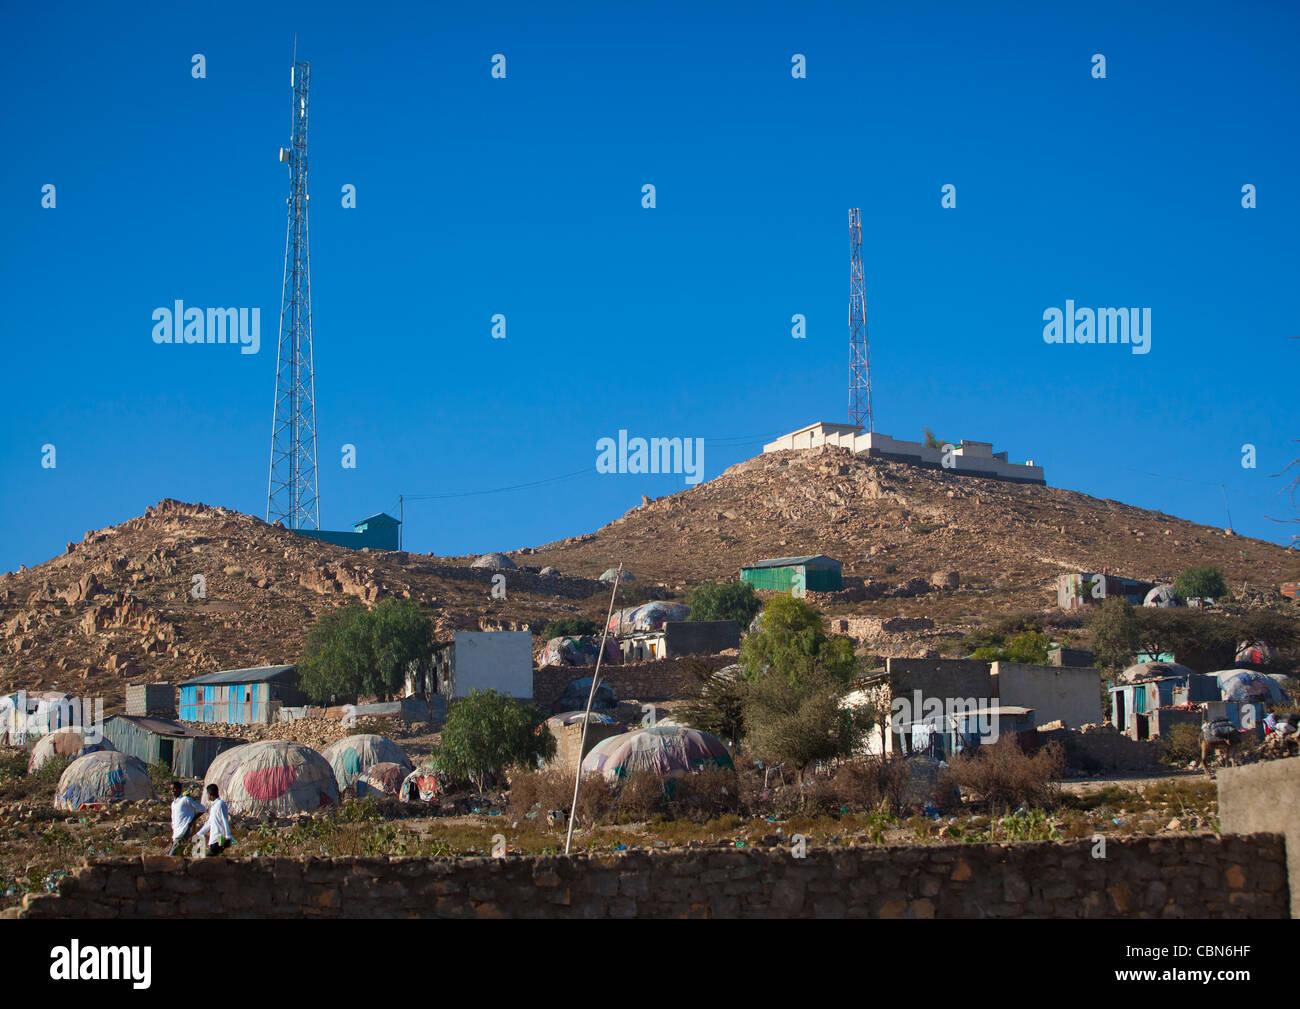 Antennas On Top Of Hills And Slum Huts Village Down Boorama Somaliland Stock Photo